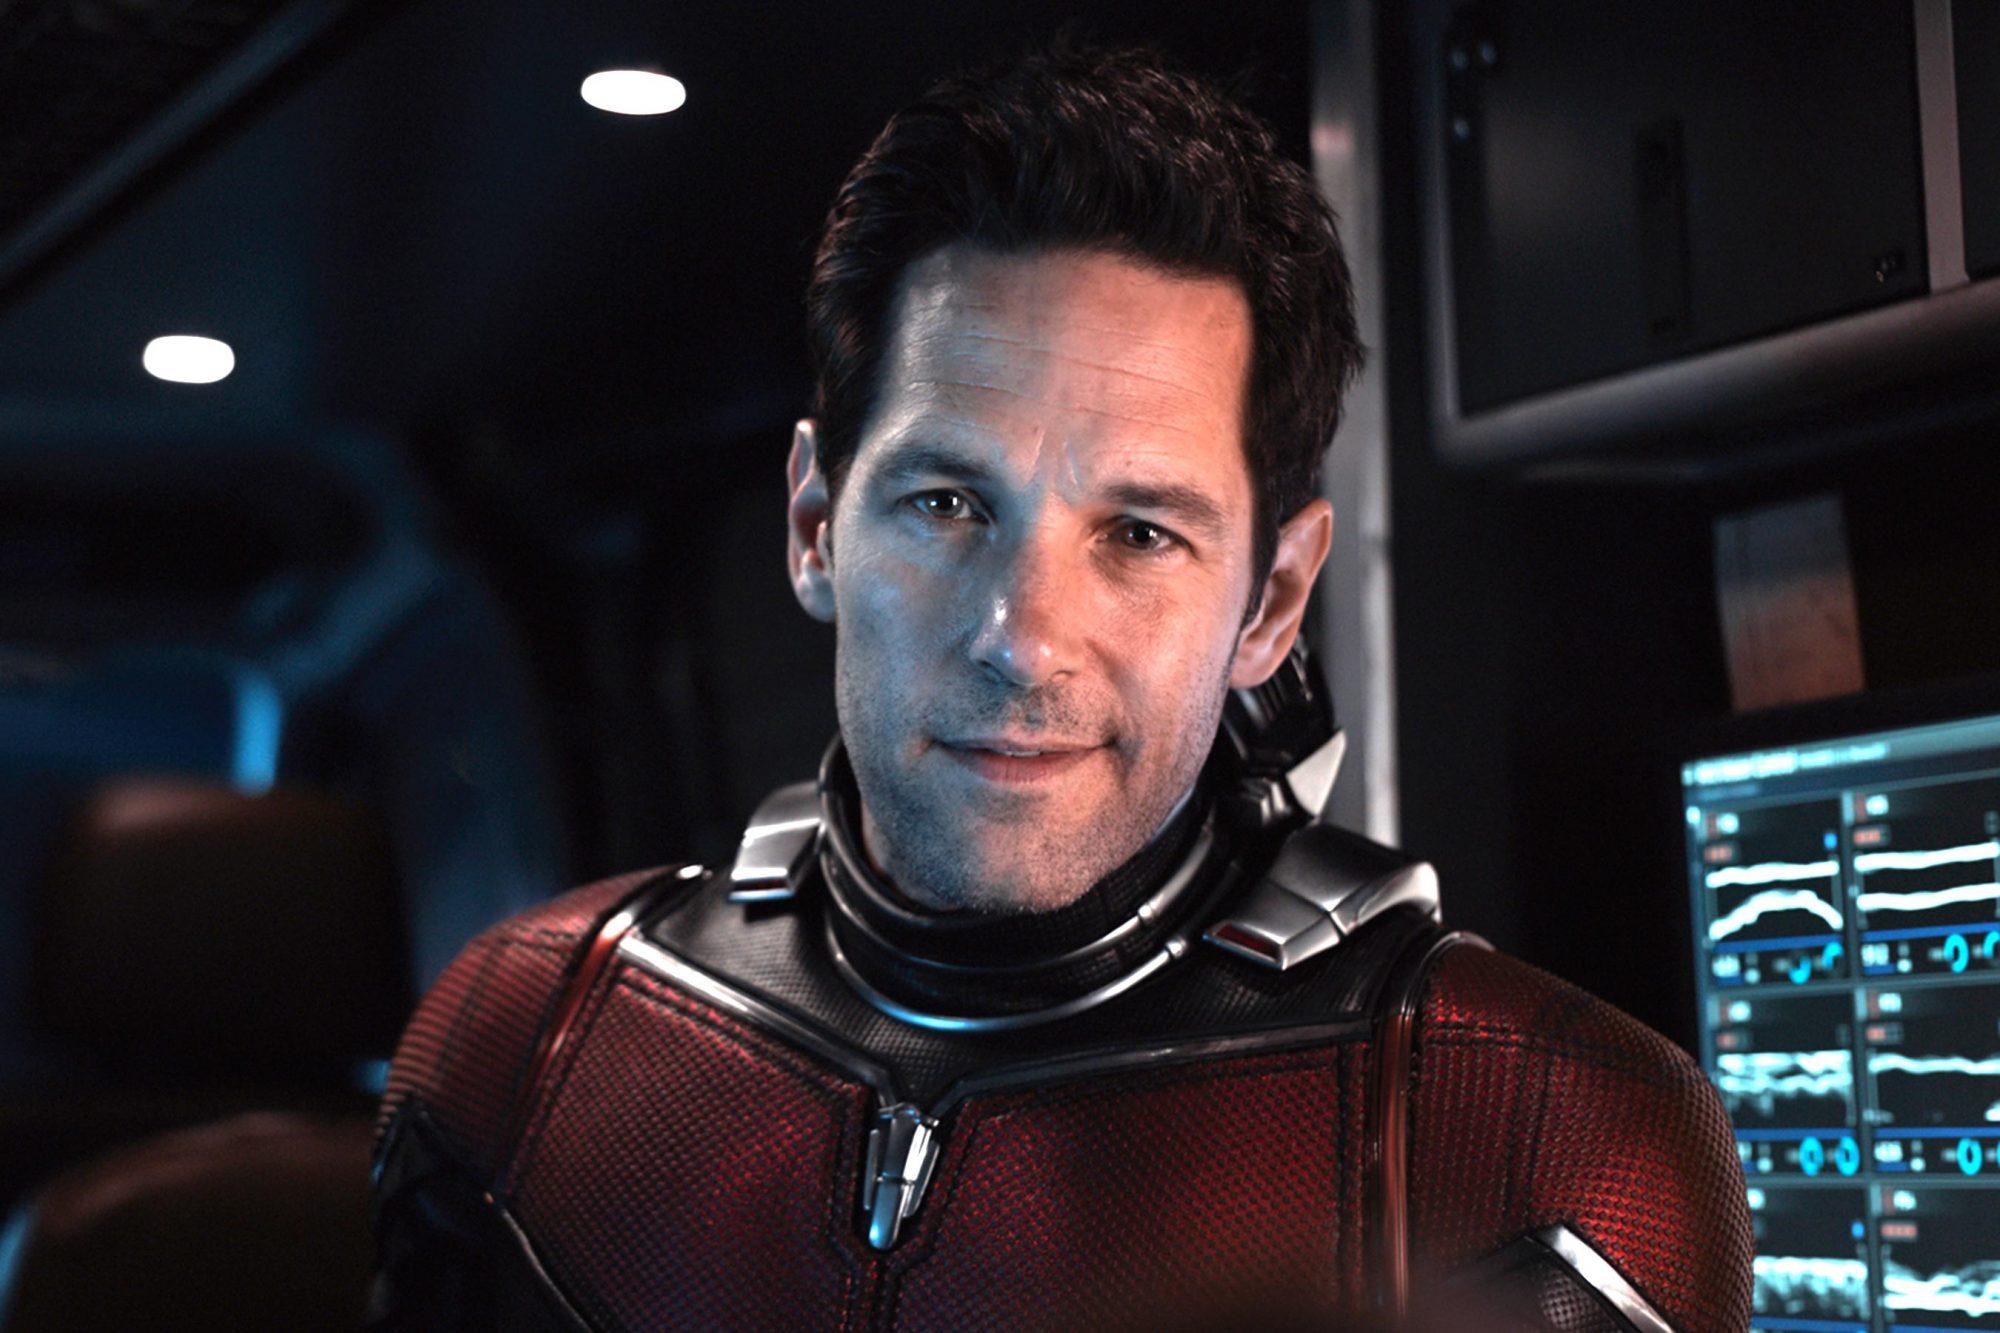 12. Ant-Man